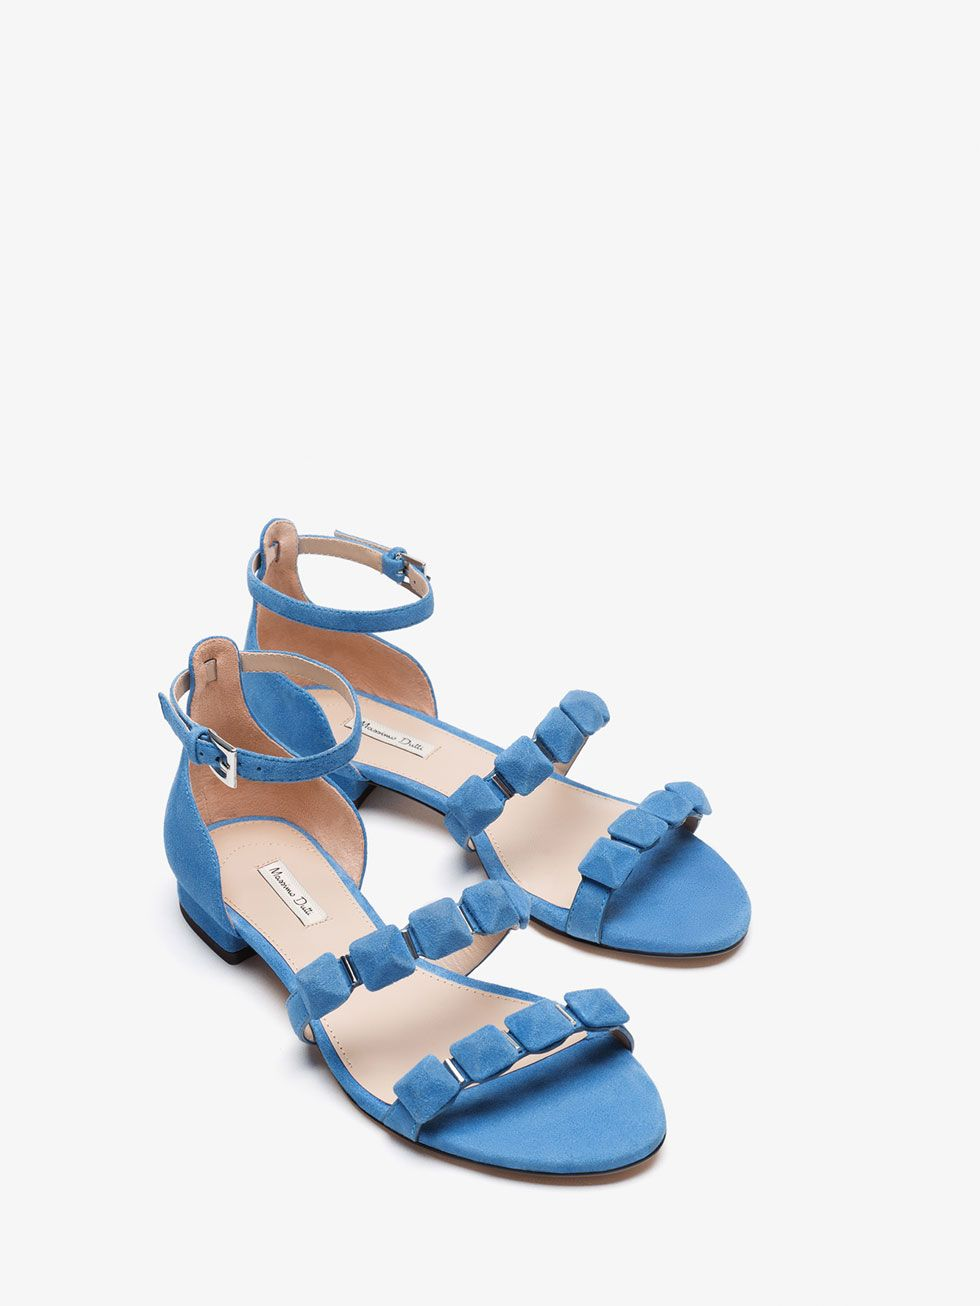 Massimo Todo Azul Piel Zapatos Sandalia De Ante Mujer Ver NnwO8vm0